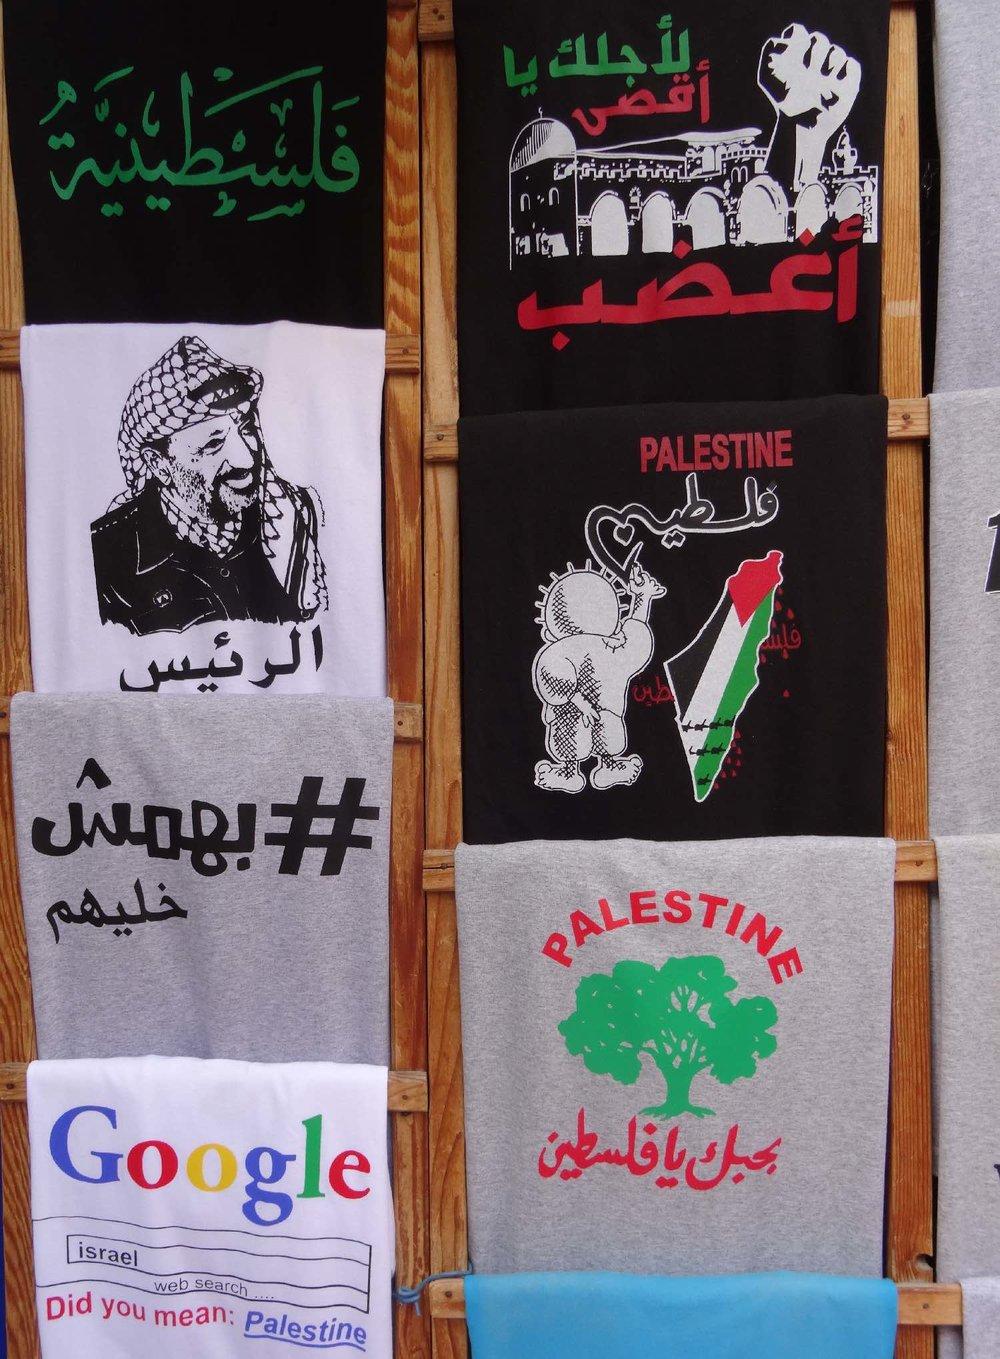 Jerusalem old city | T-shirt shop | Arafat on t-shirt | Palestine land on t-shirt | photo sandrine cohen